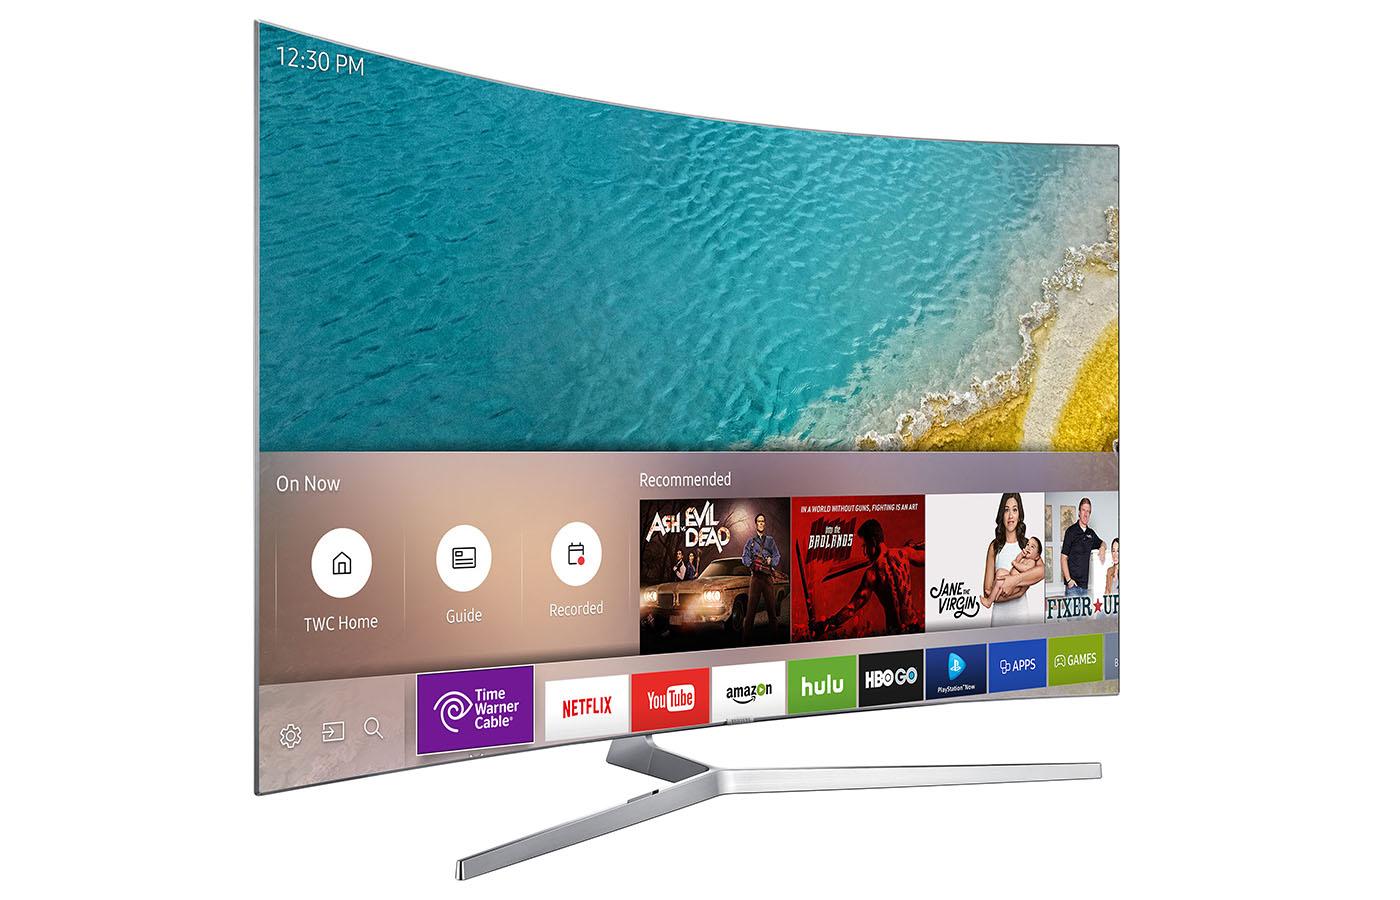 Samsung Smart TV Ad Tiles